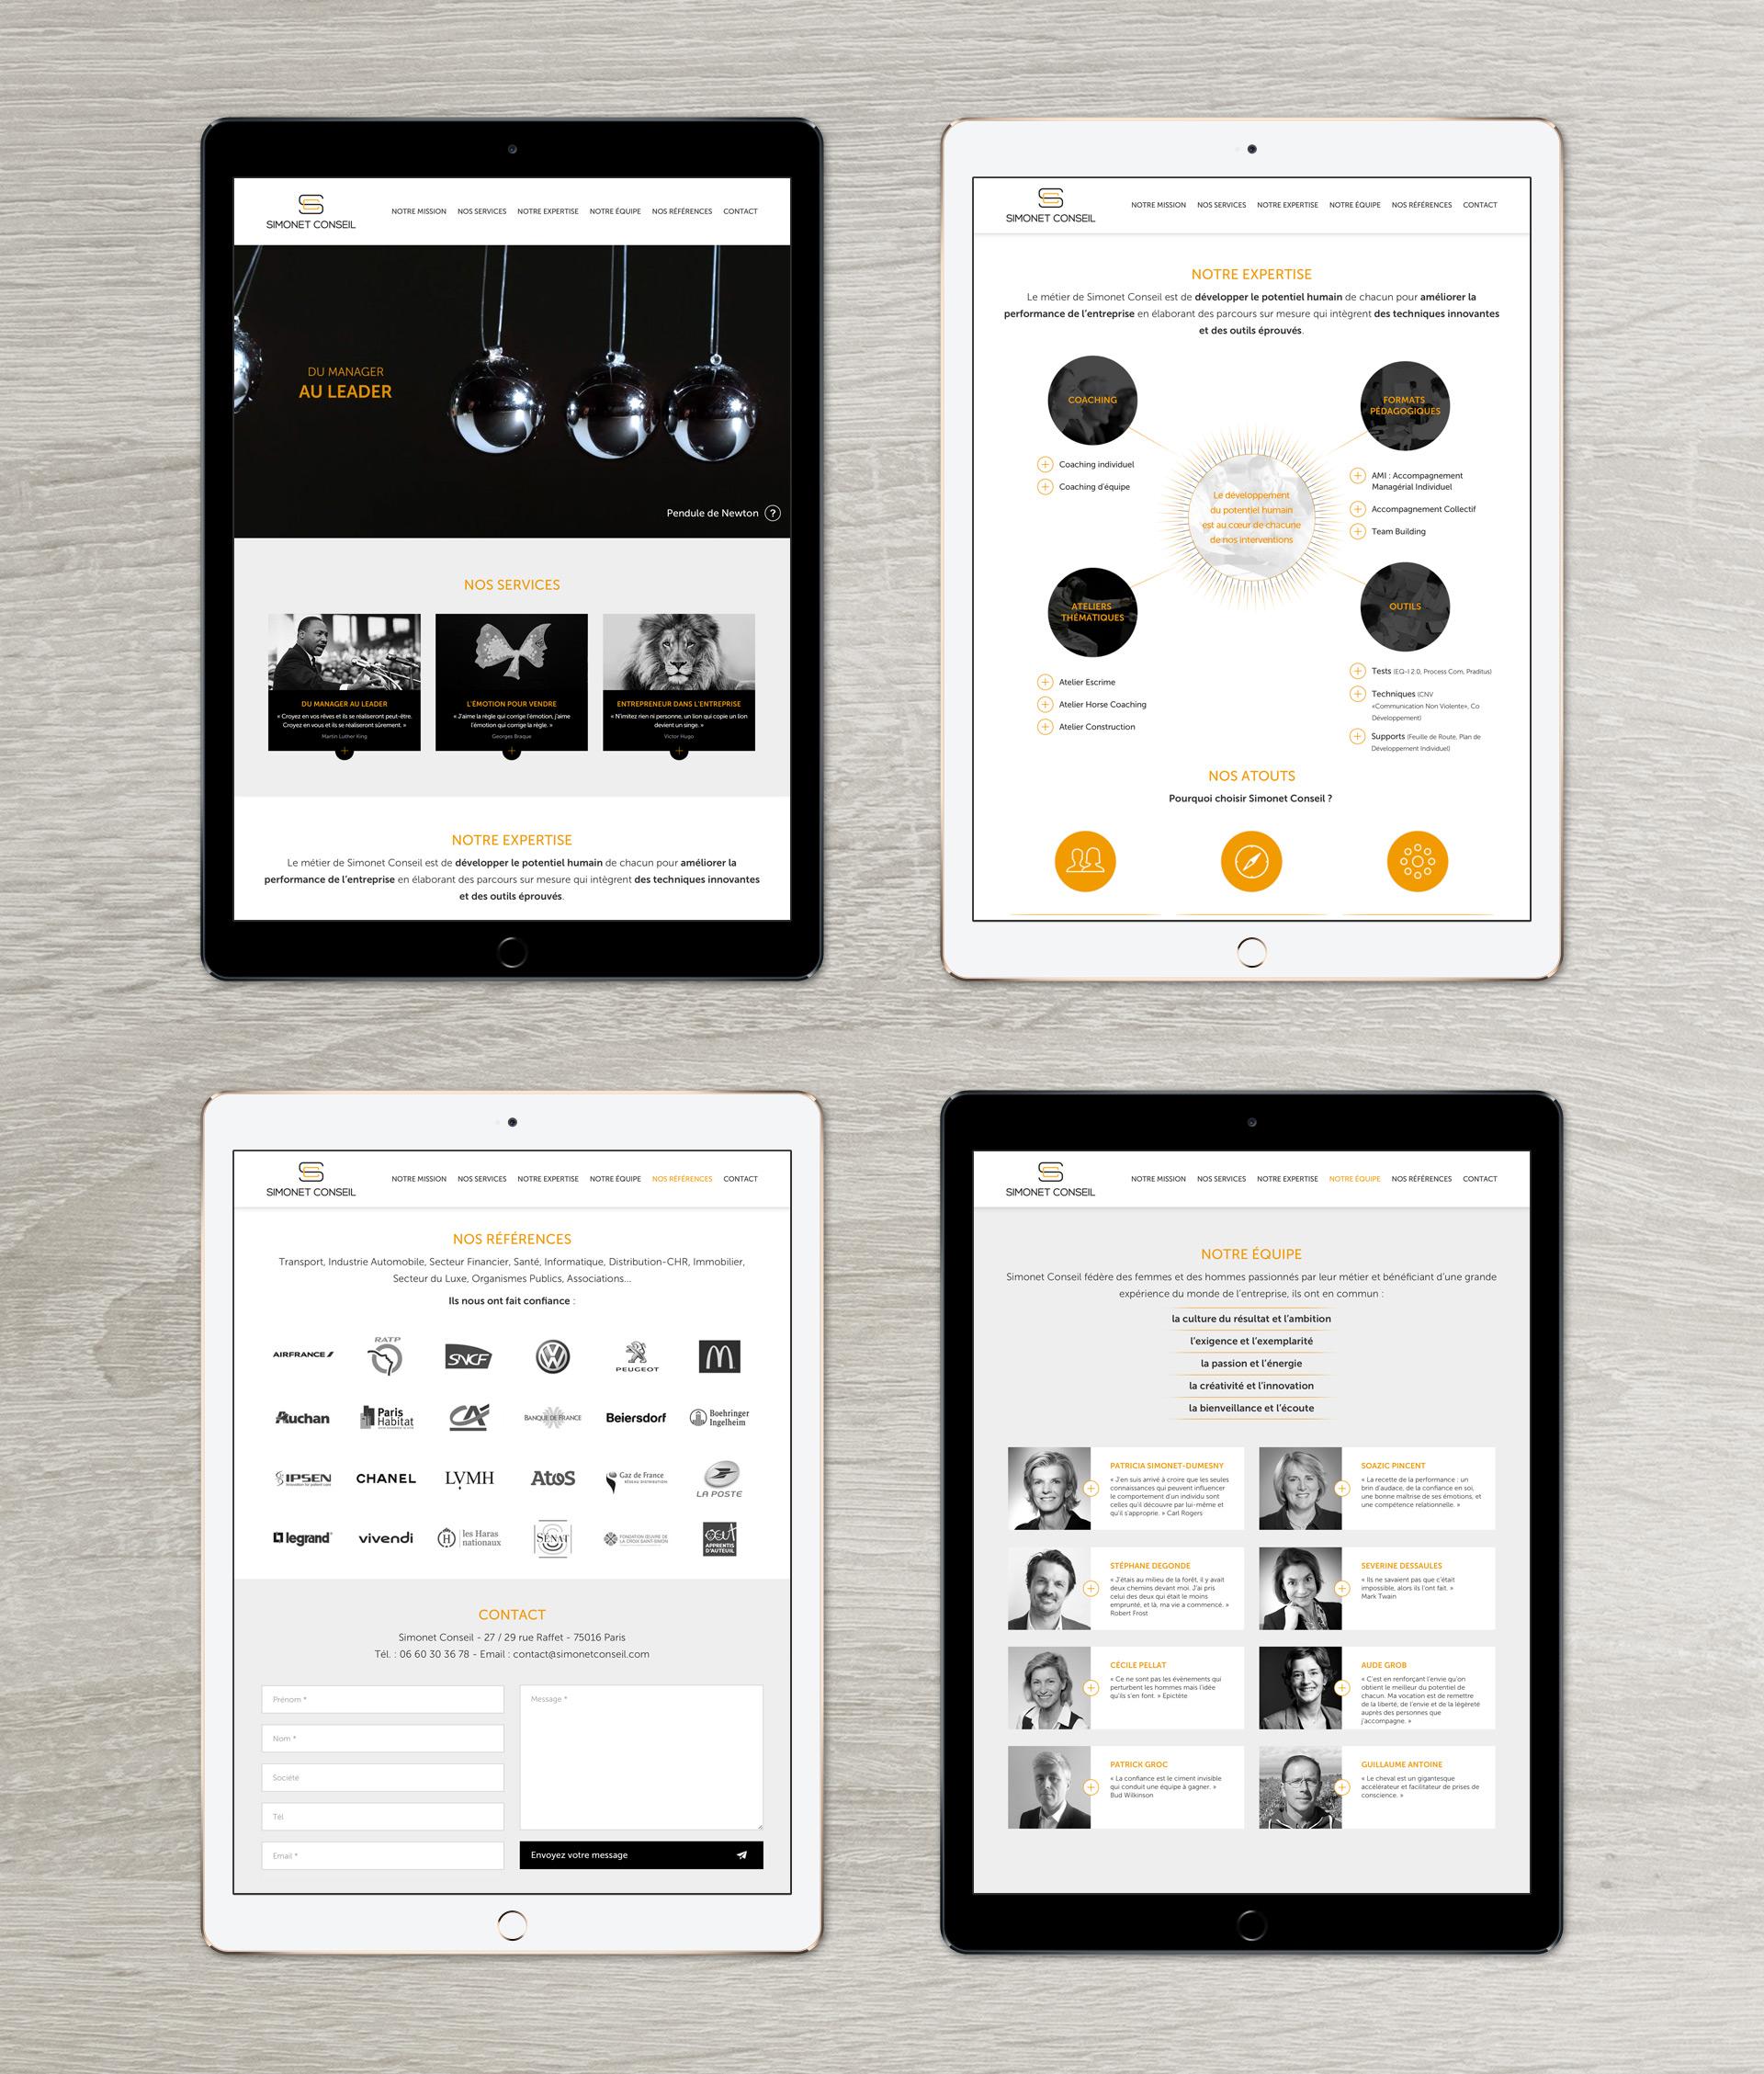 simonet-conseil-creation-site-internet-responsive-design-caconcept-alexis-cretin-graphiste-montpellier